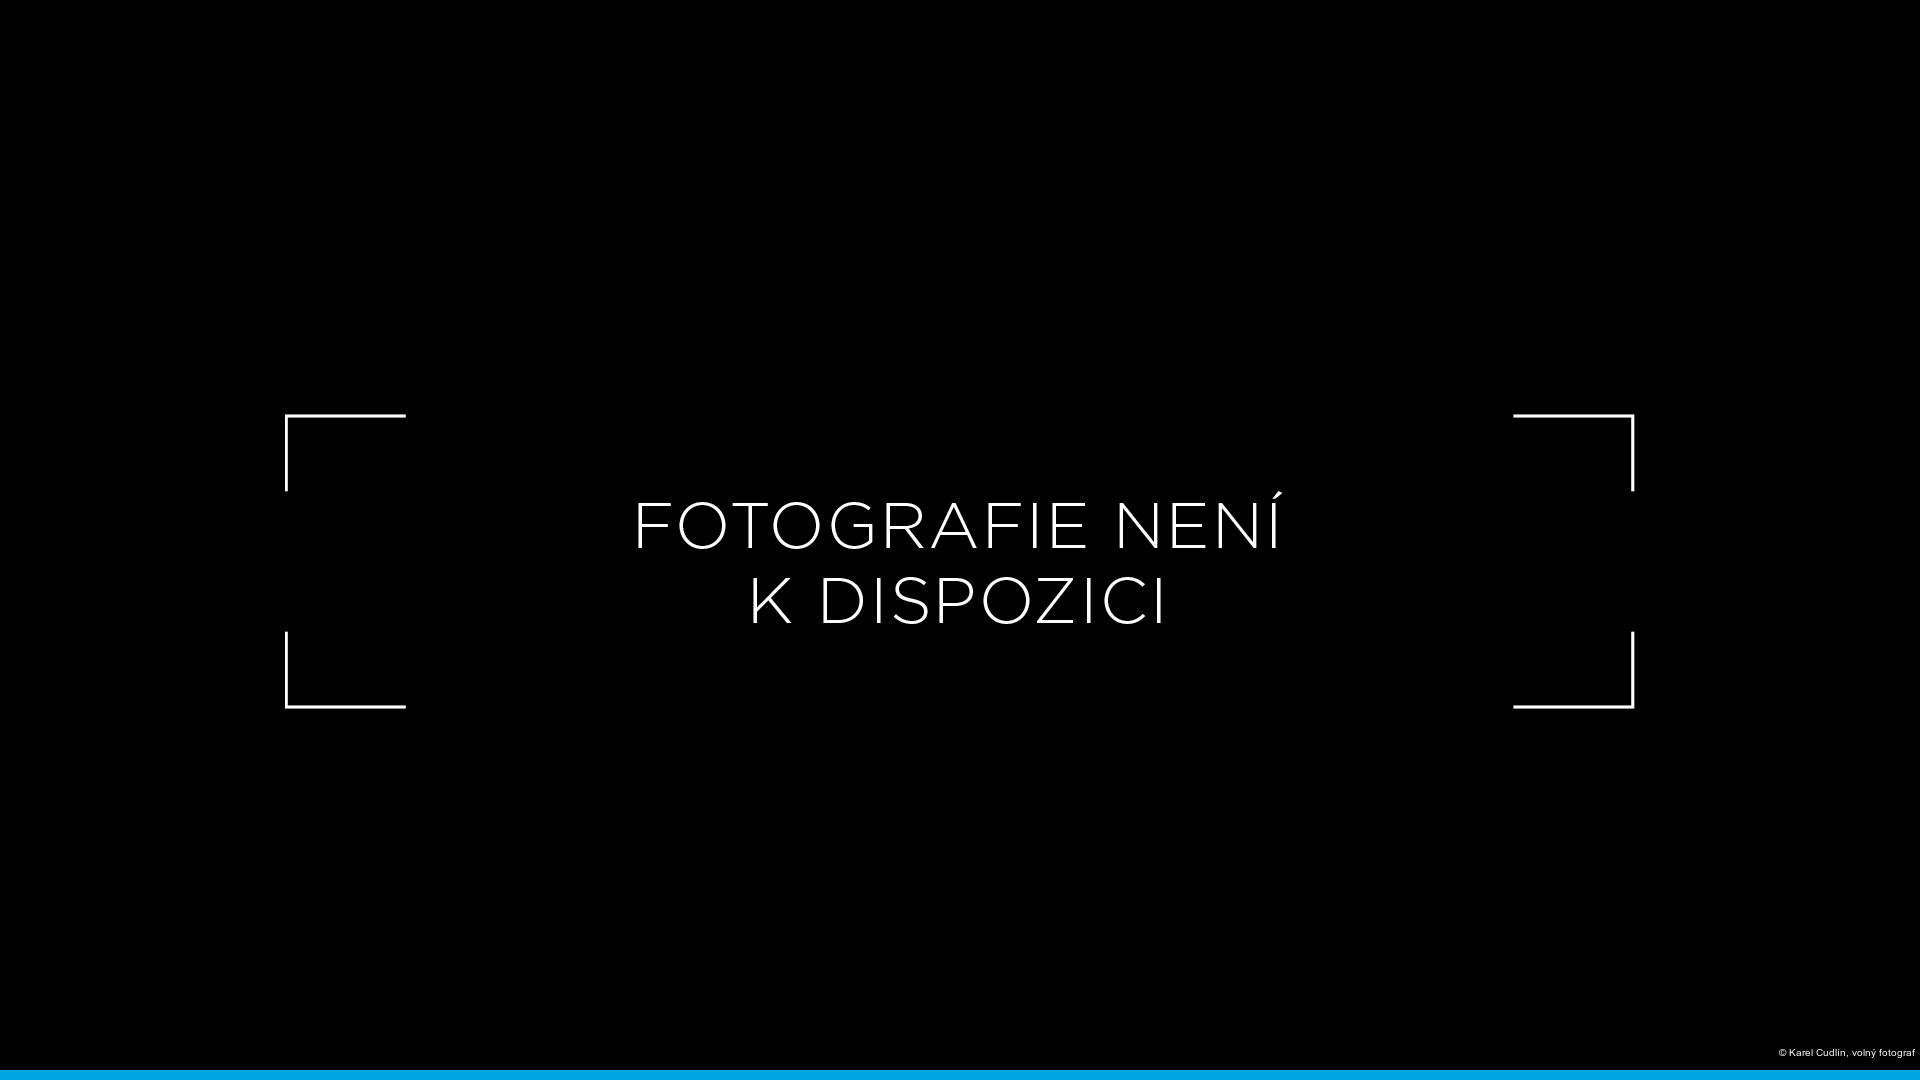 Karel Cudlín, volný fotograf